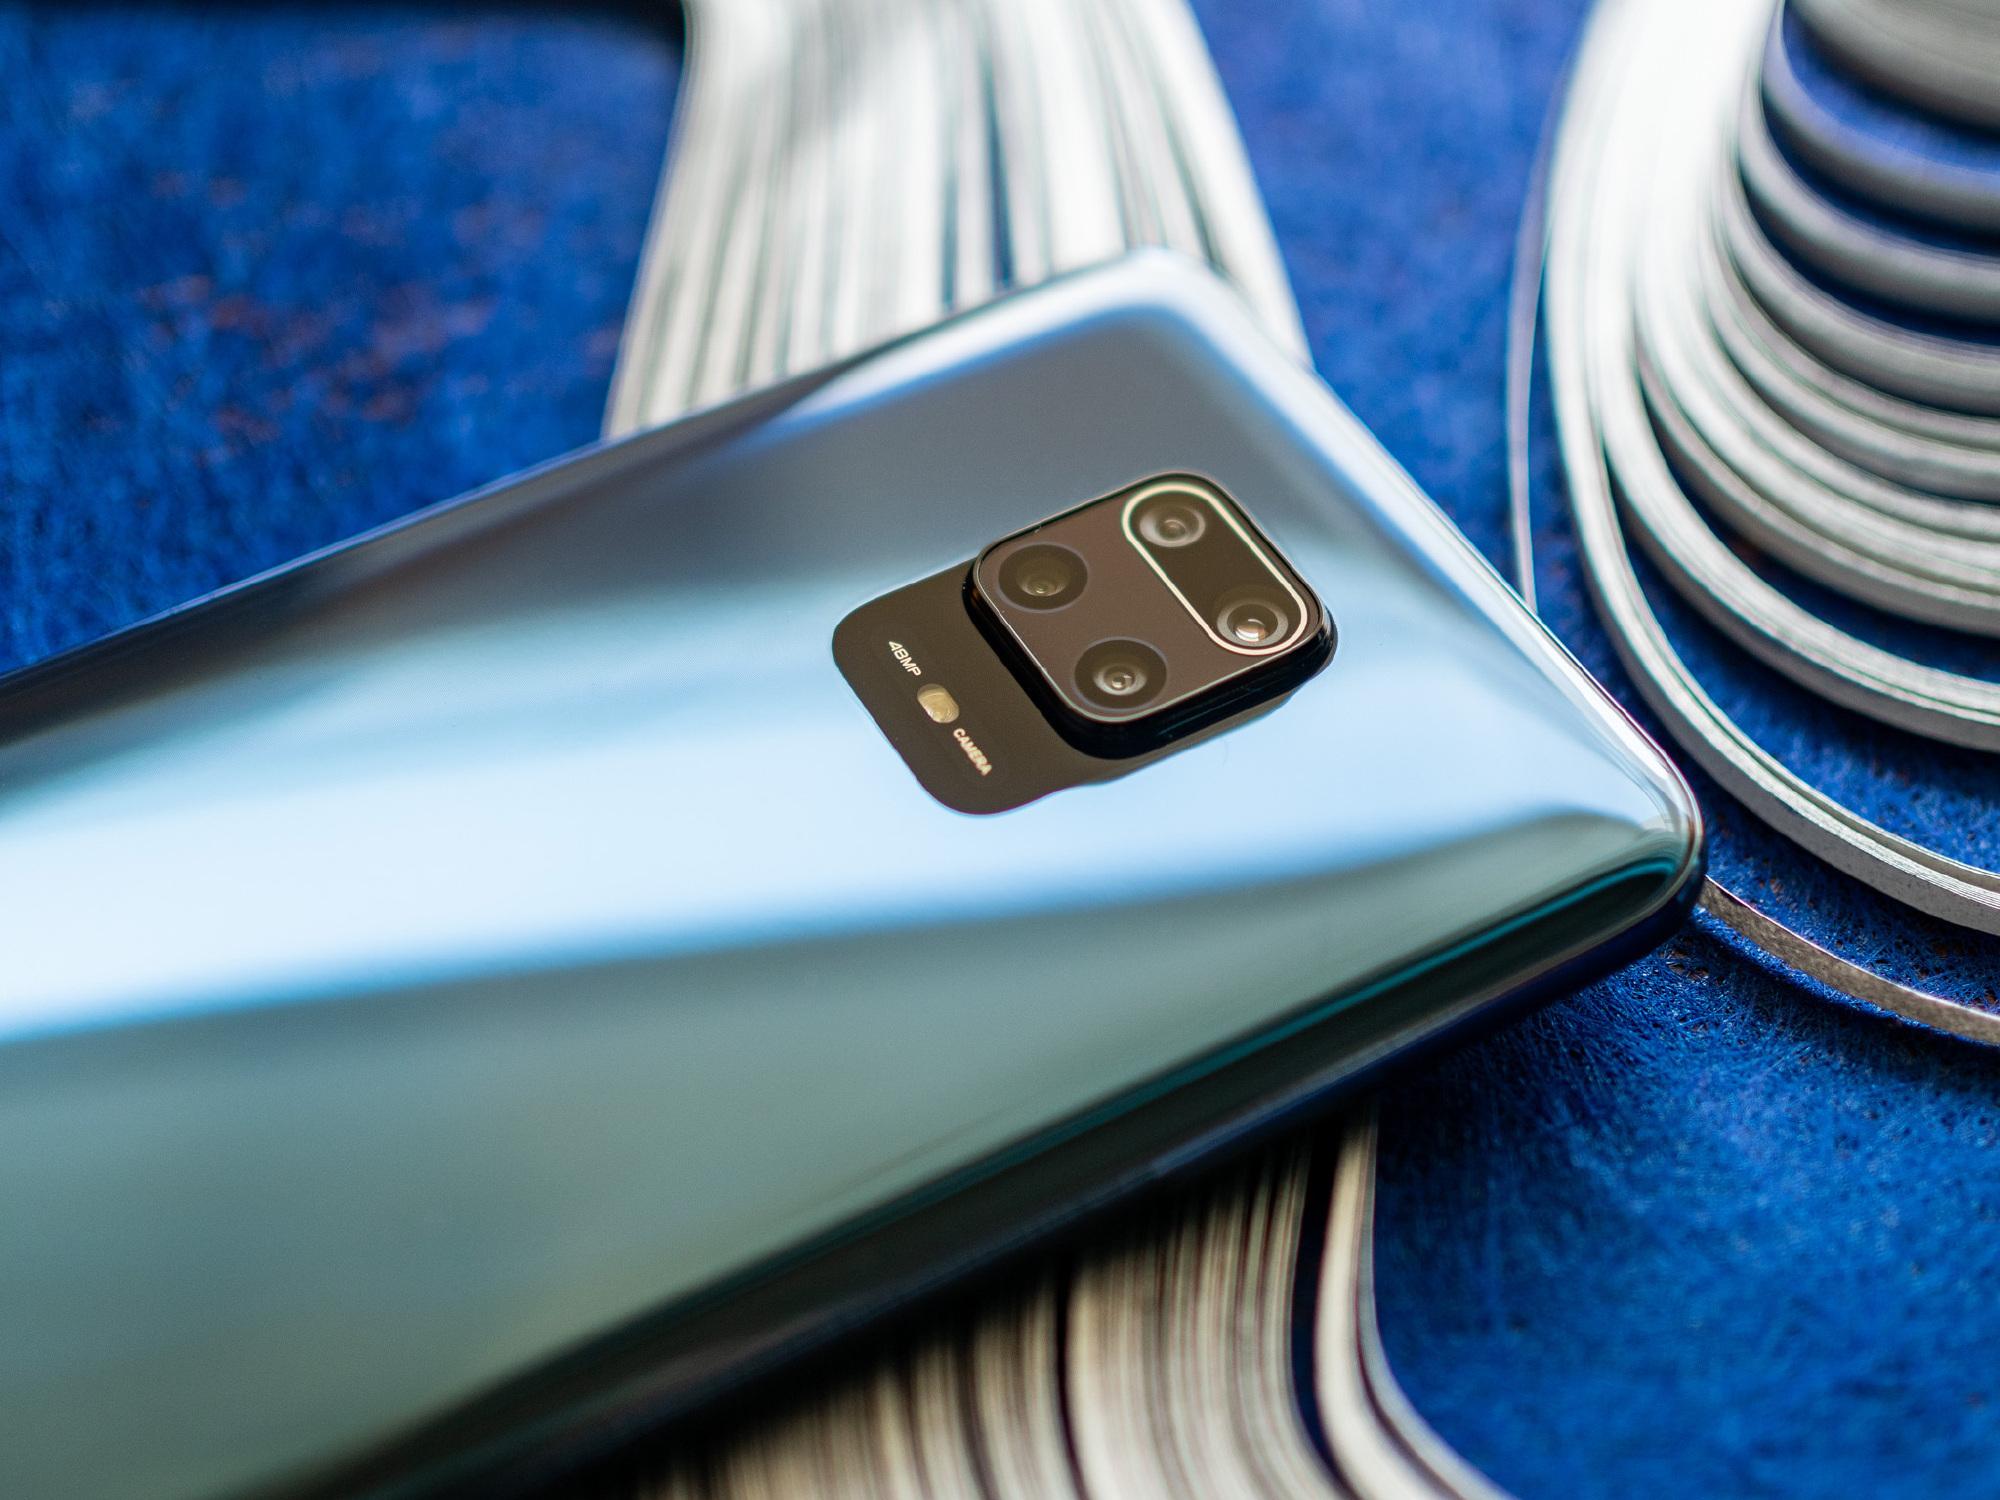 Redmi Note9 現在手機攝像頭真的是千奇百狀啊這千元機好看嗎?!